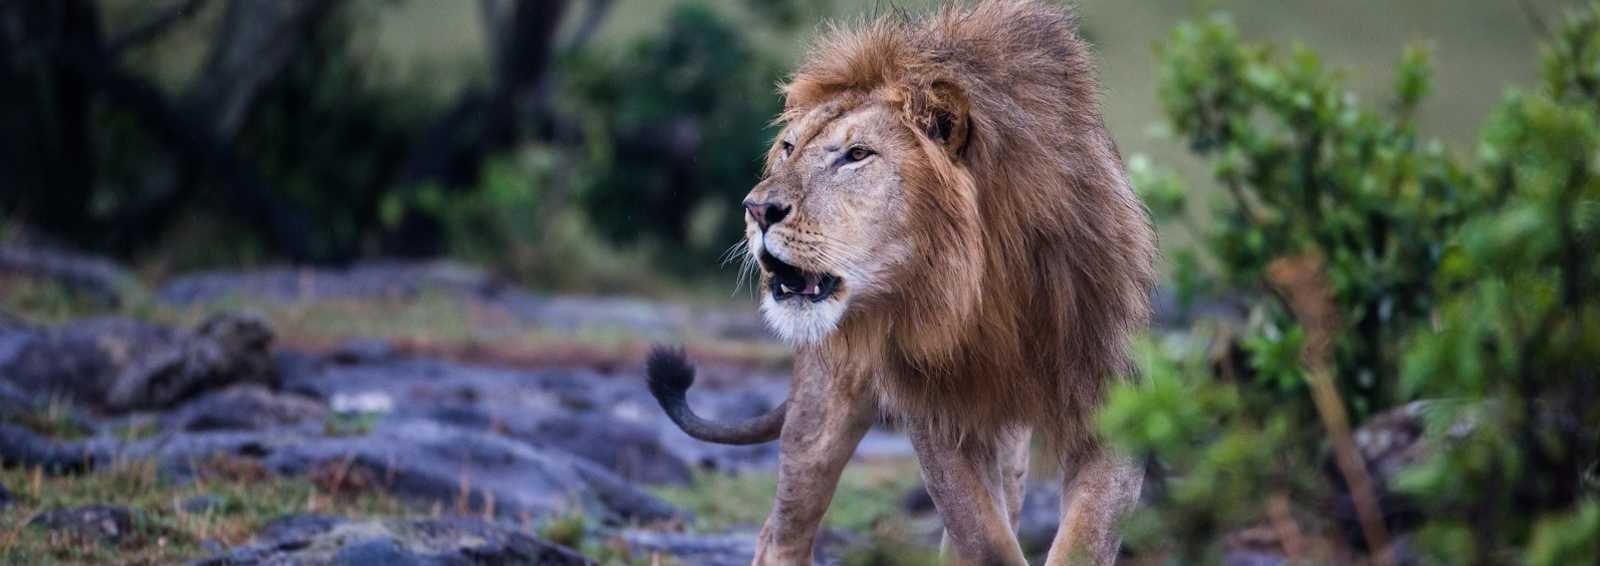 A Lion on the Masai Mara, Kenya